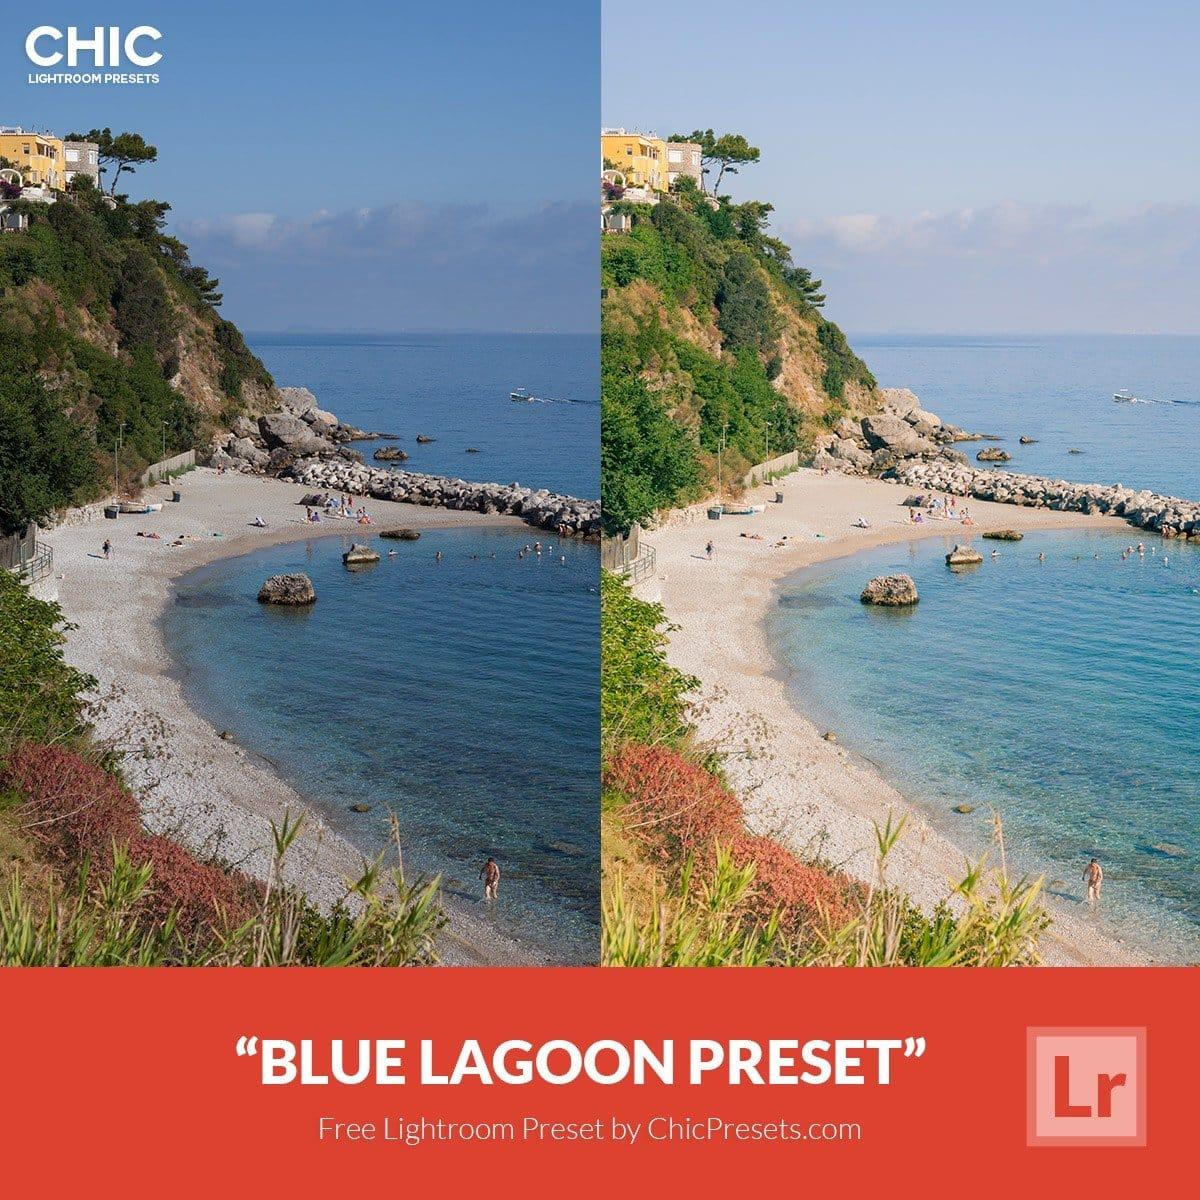 Chic-Presets-Free-Lightroom-Preset-Blue-Lagoon-Presetpro.com